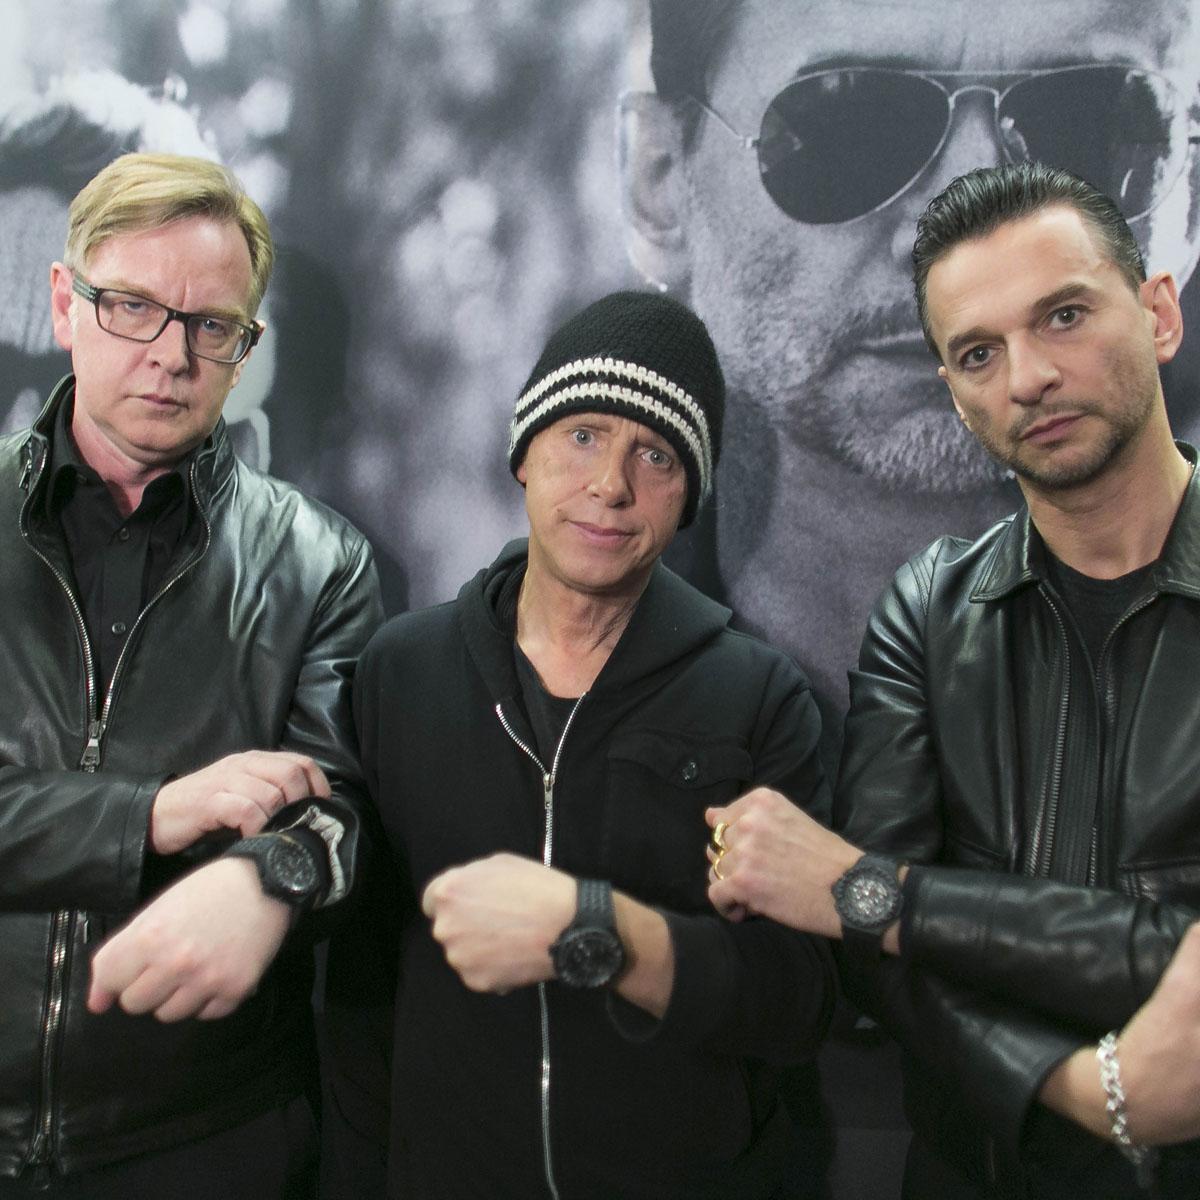 Depeche Mode - Blasphemous Rumours / It's Called A Heart